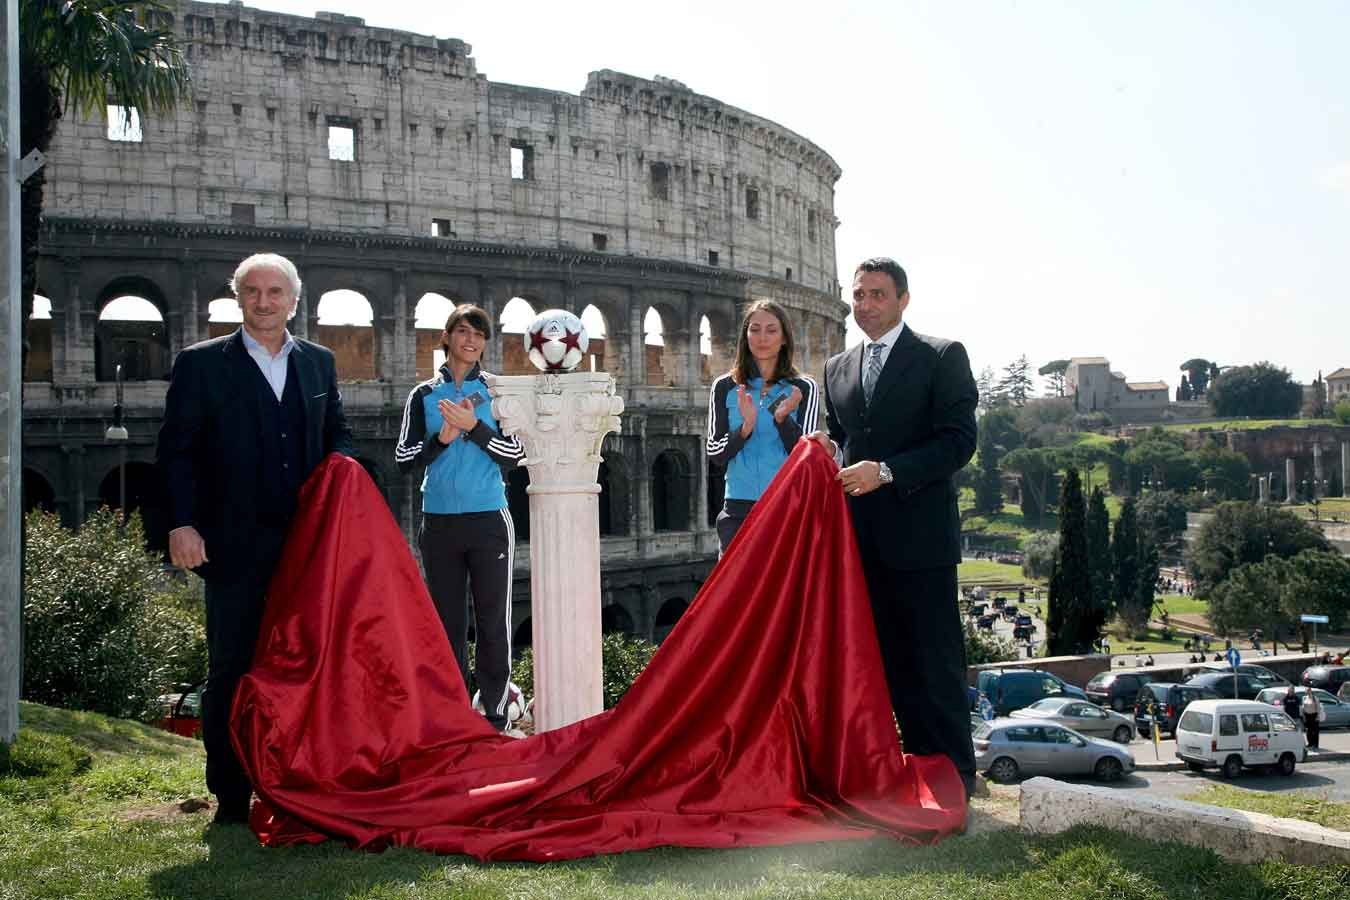 презентация мяча финала лиги чемпионов 2009 - adidas finale roma